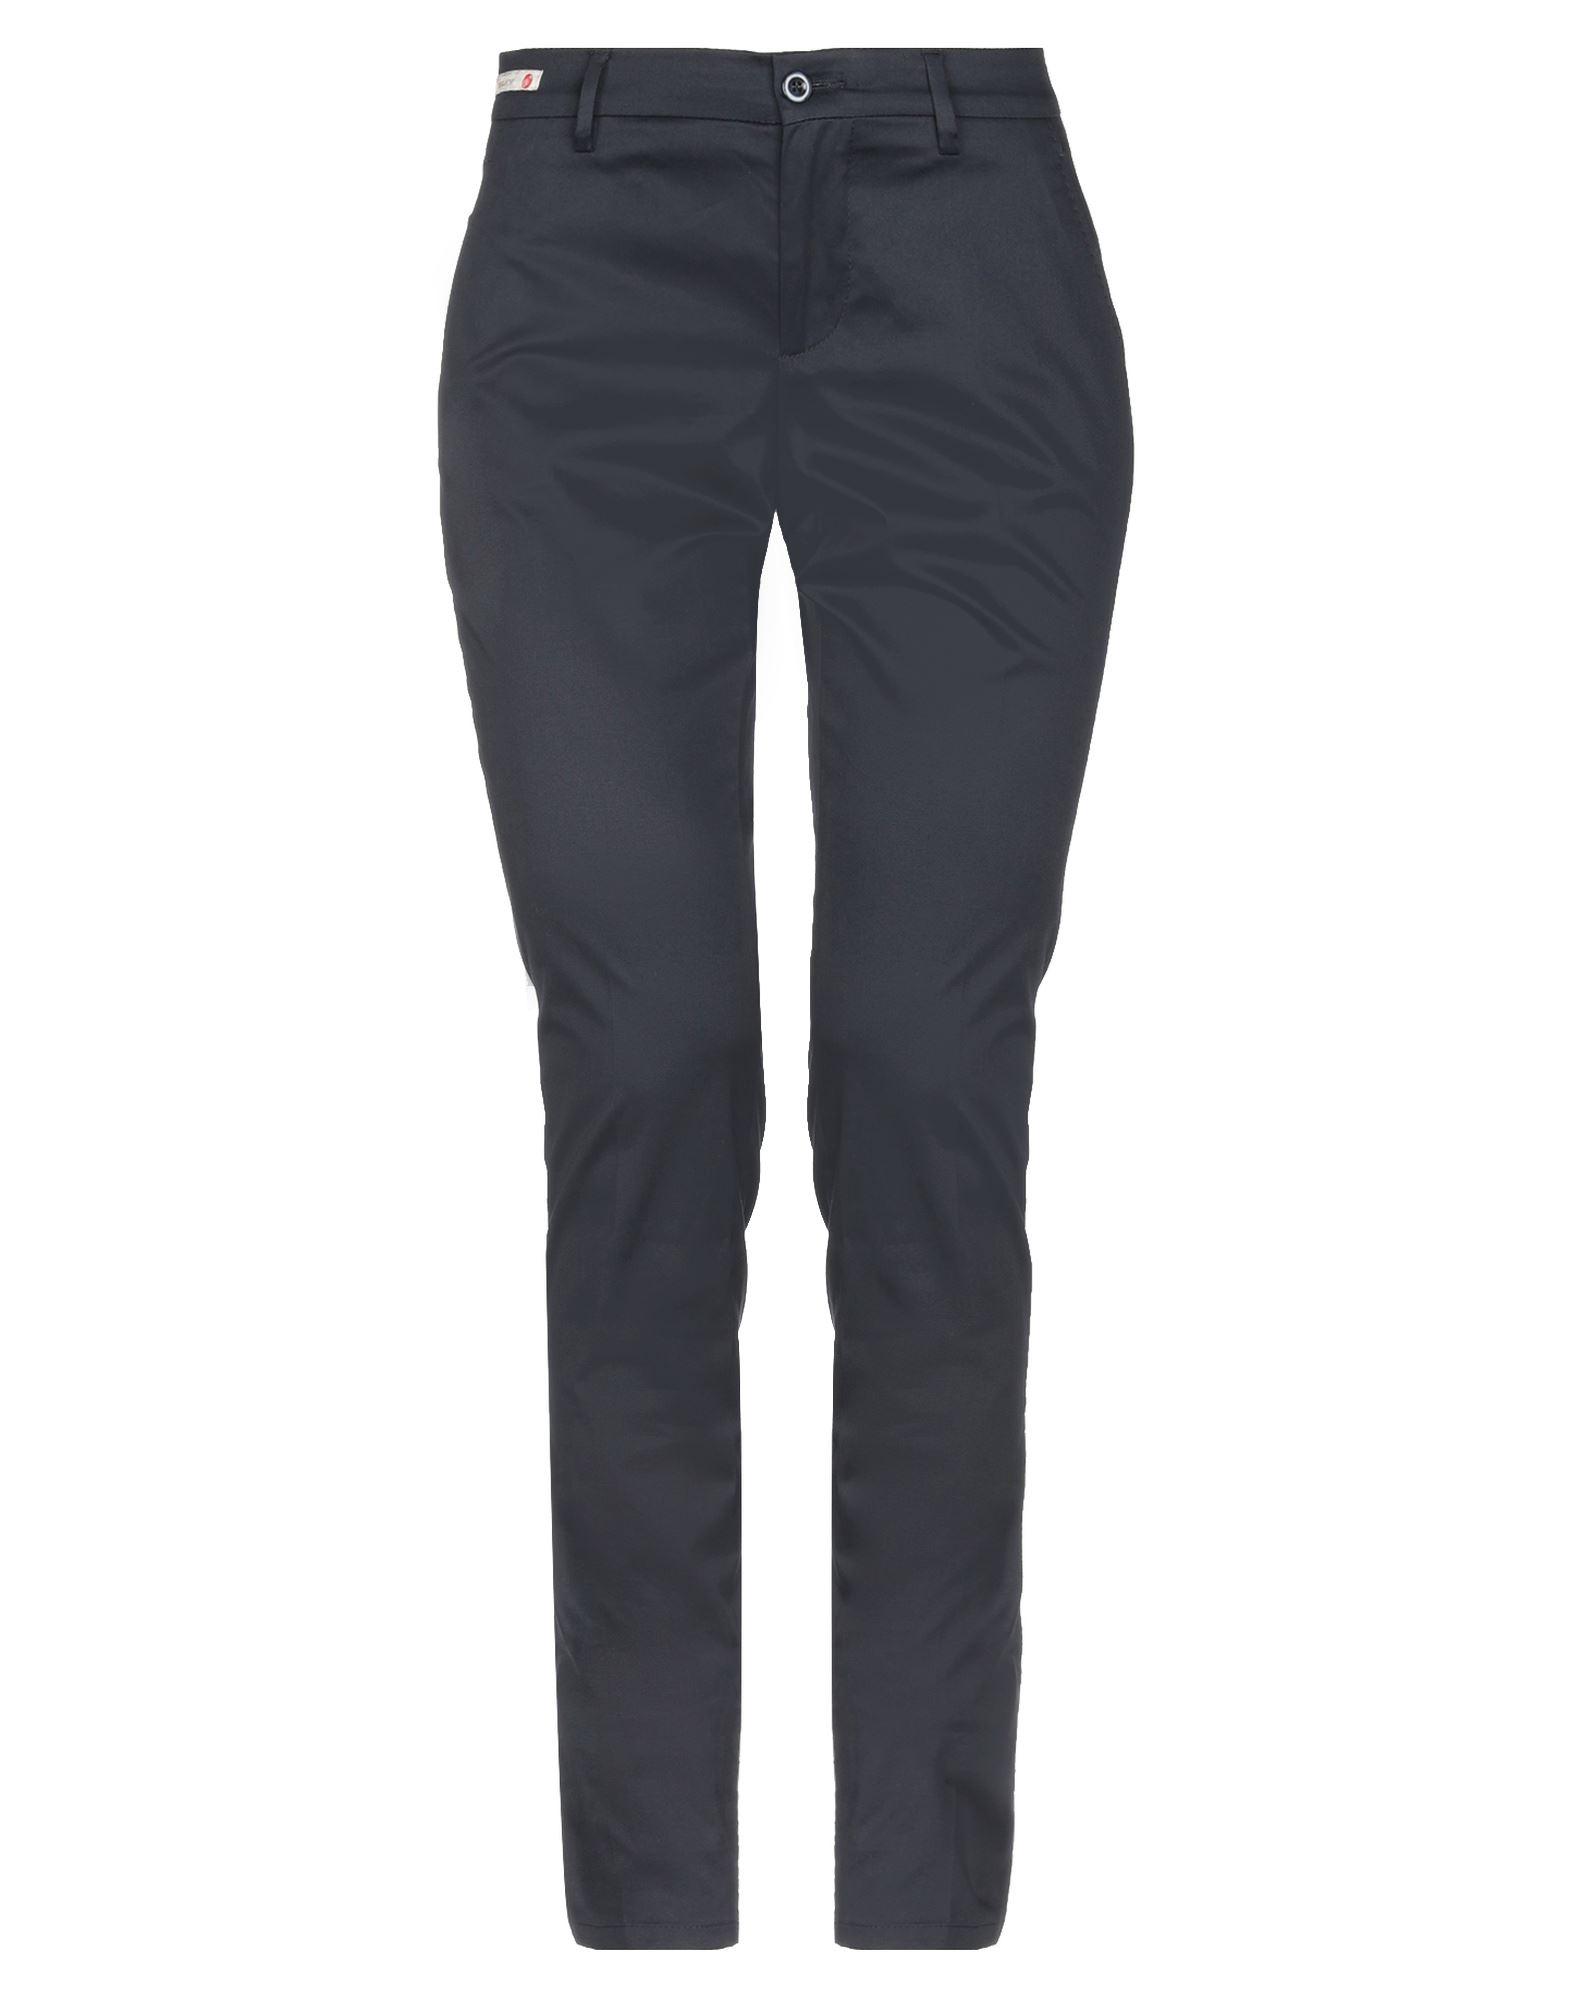 Pantalone Berwich donna - 13286337FW 13286337FW  Werbeartikel